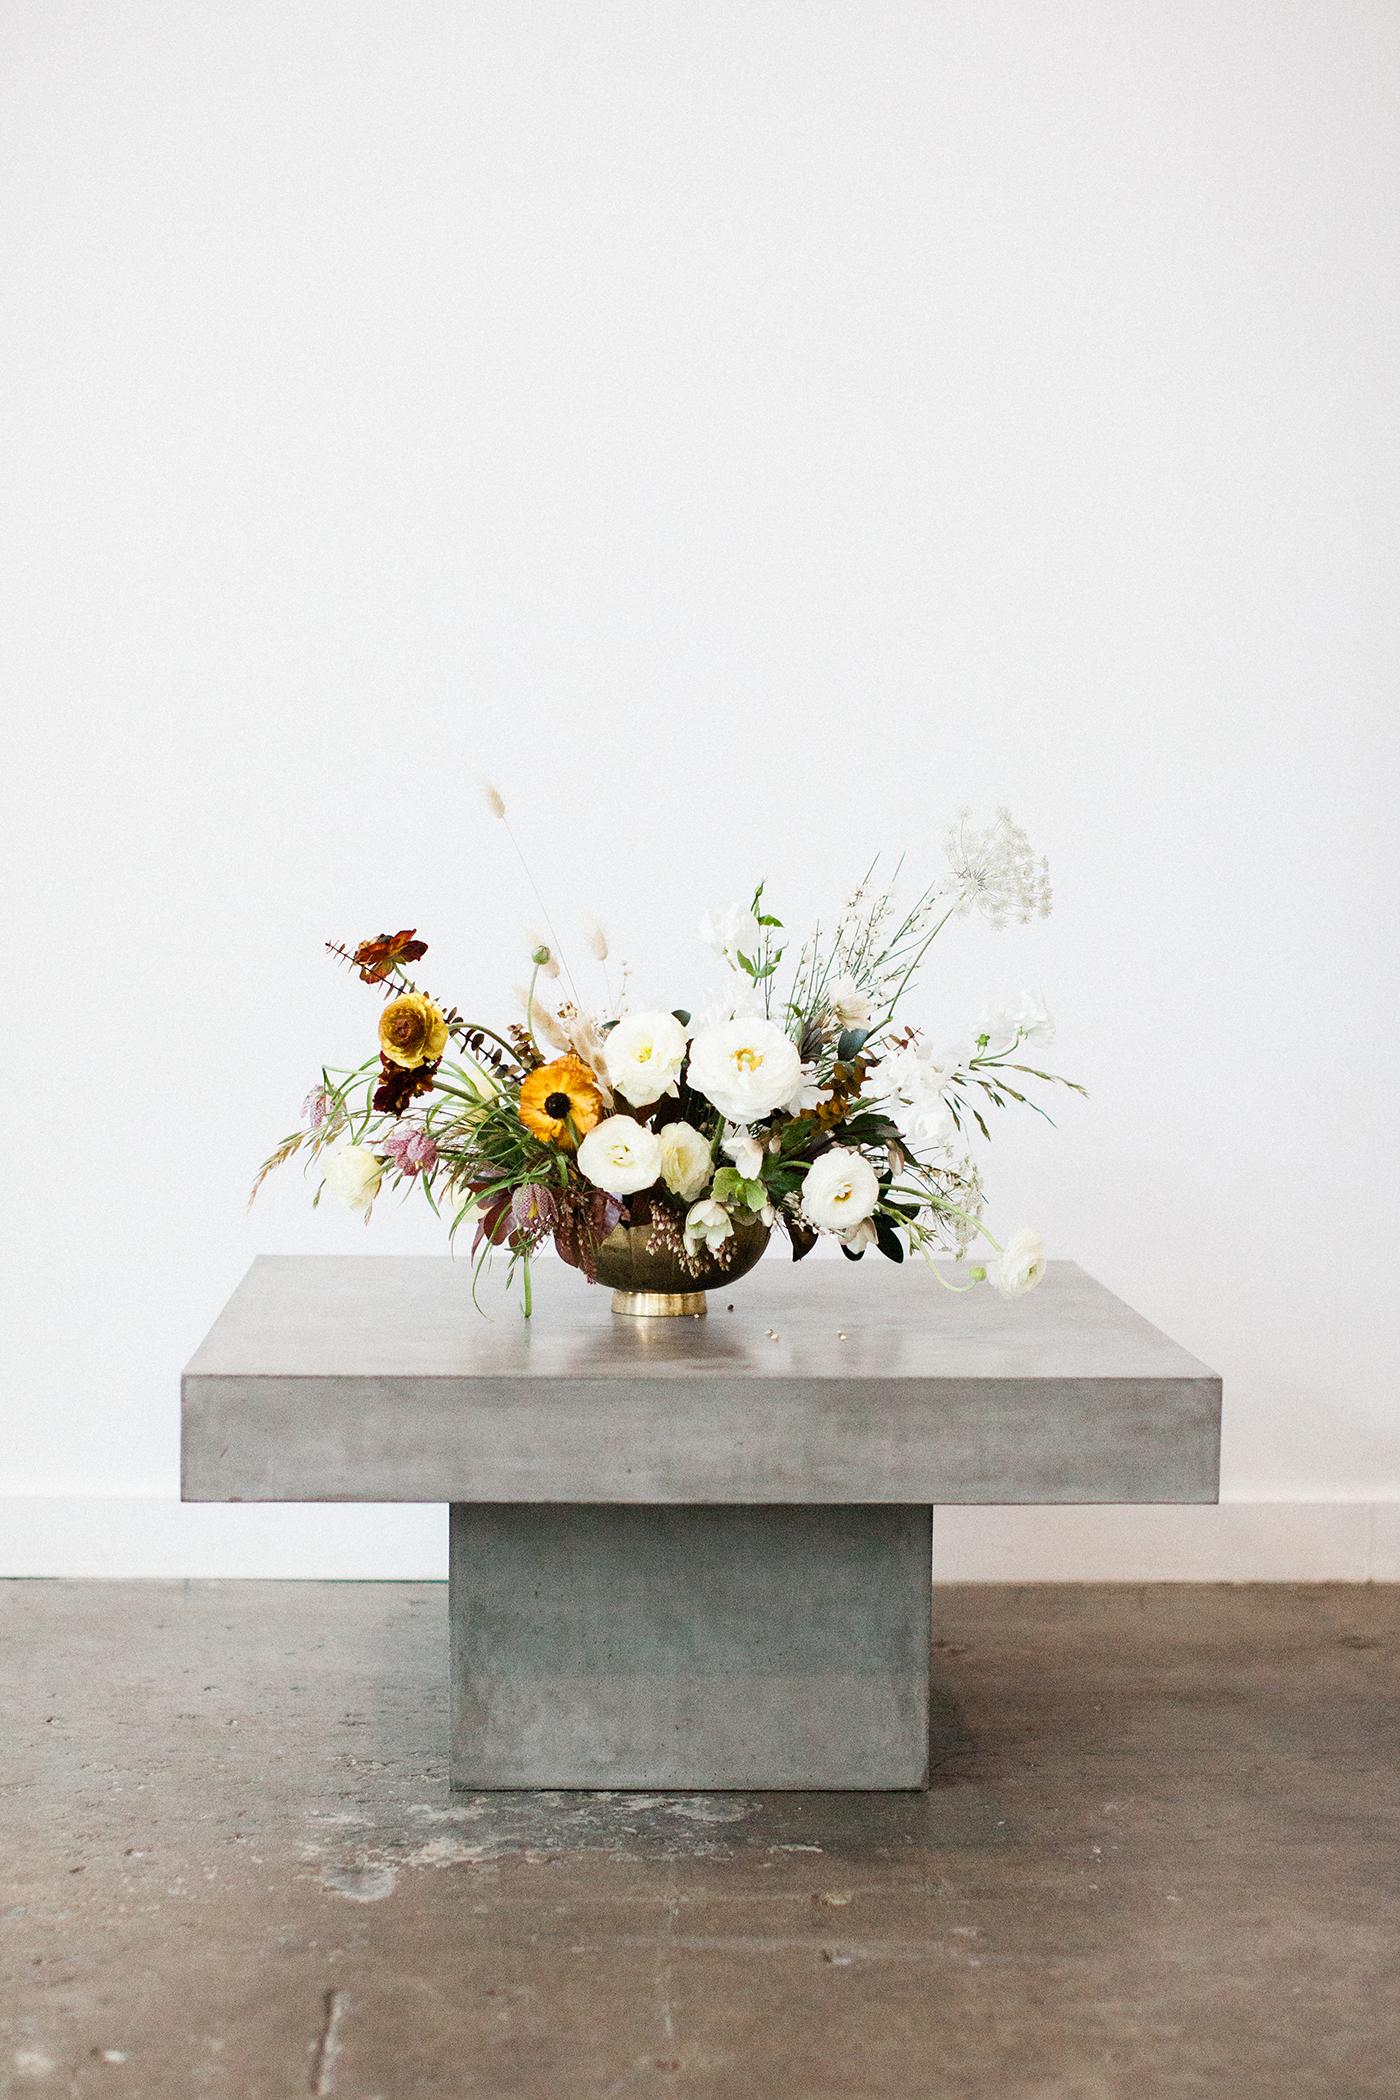 Wedding Floral Design Dallas - Olive Grove Design - Mimimalist Fall Wedding - 00013.jpg